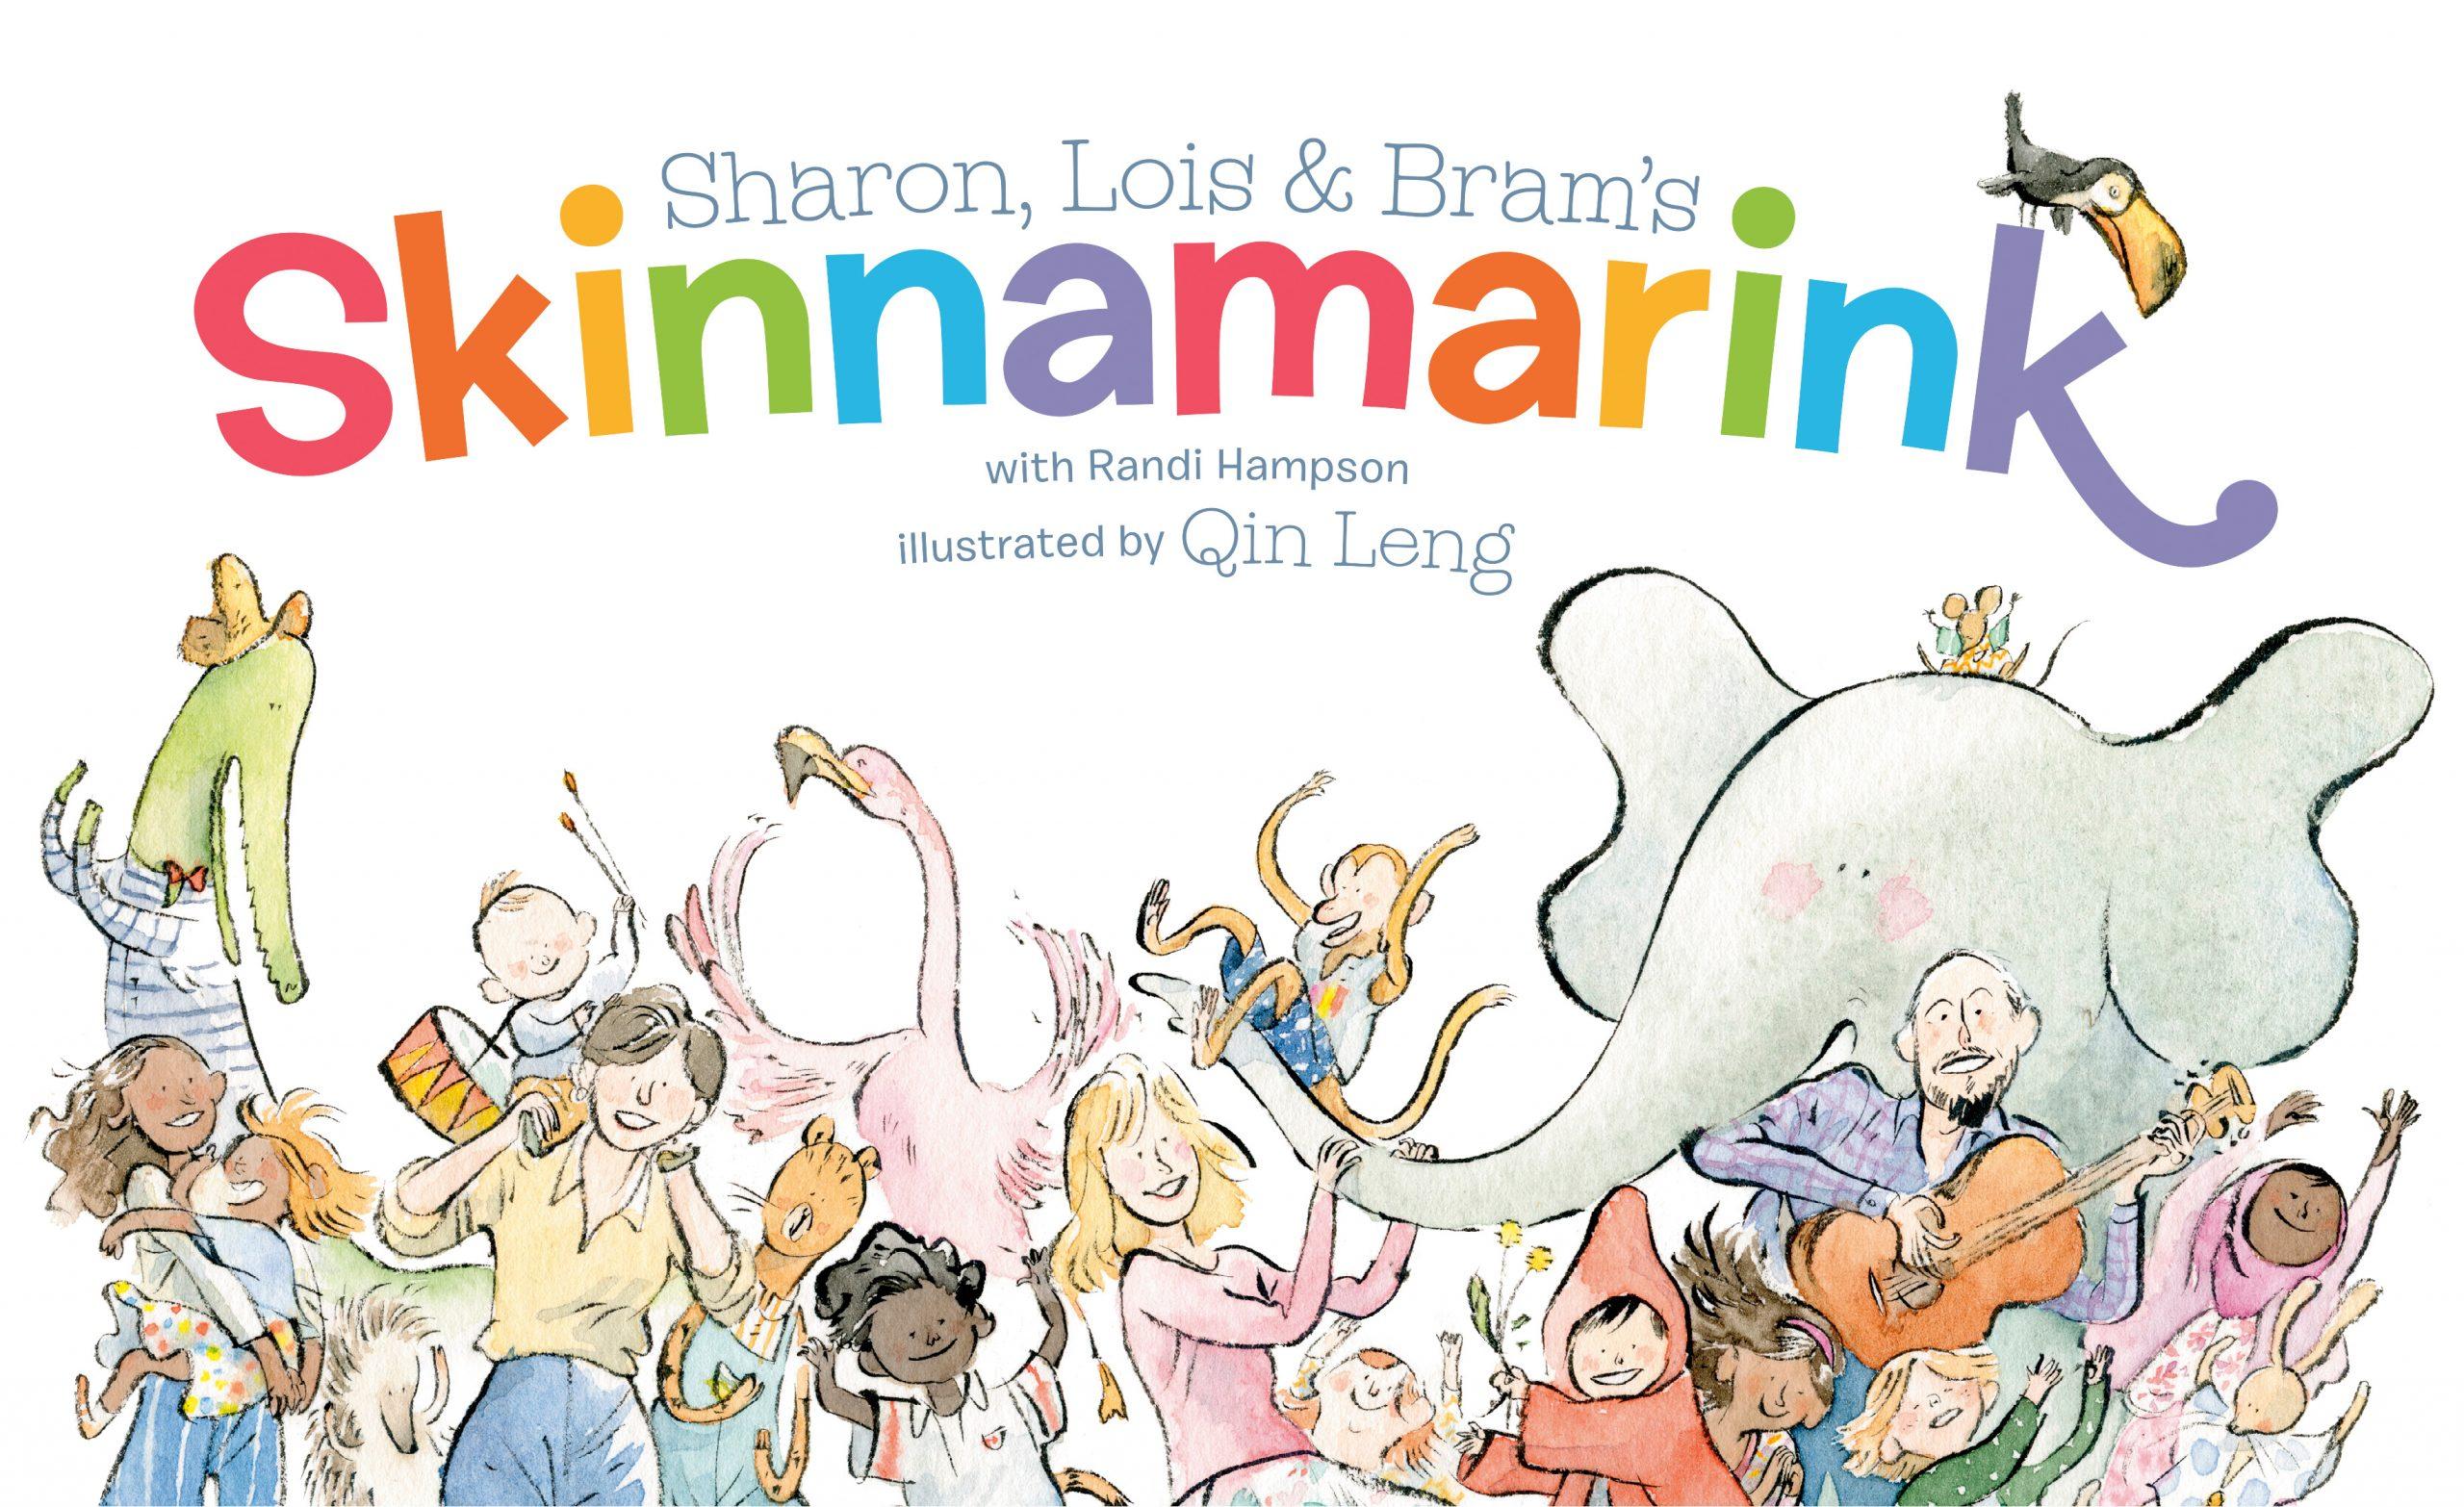 Sharon, Lois and Bram's Skinnamarink